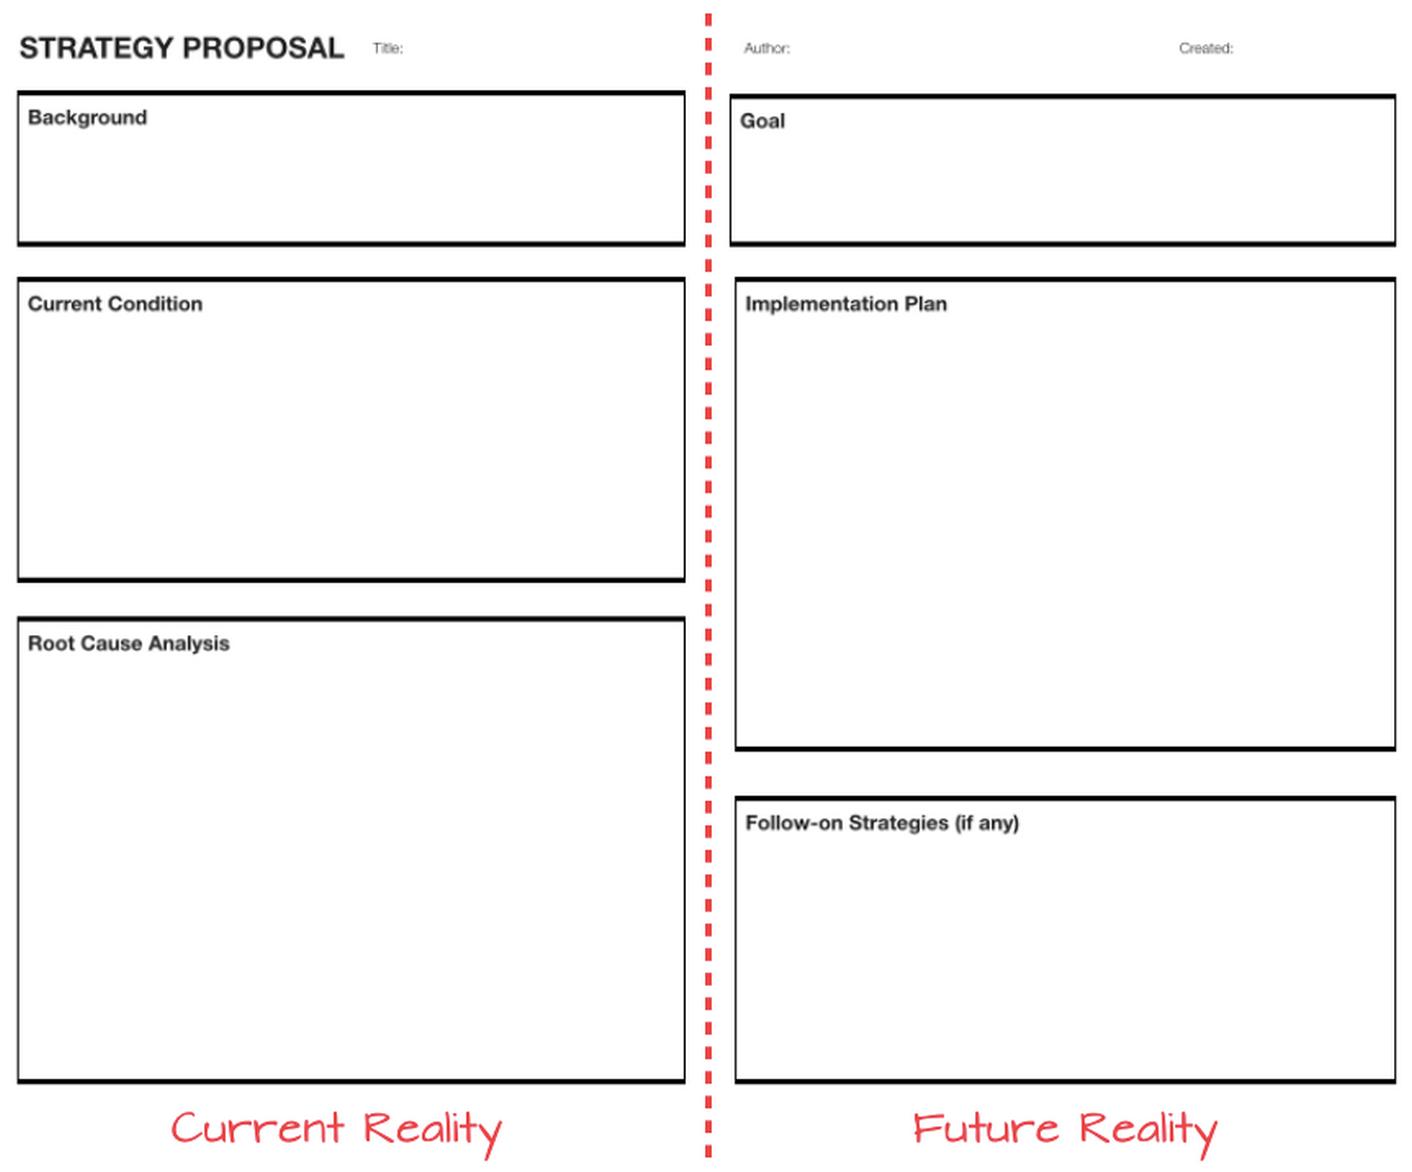 Strategy Proposal